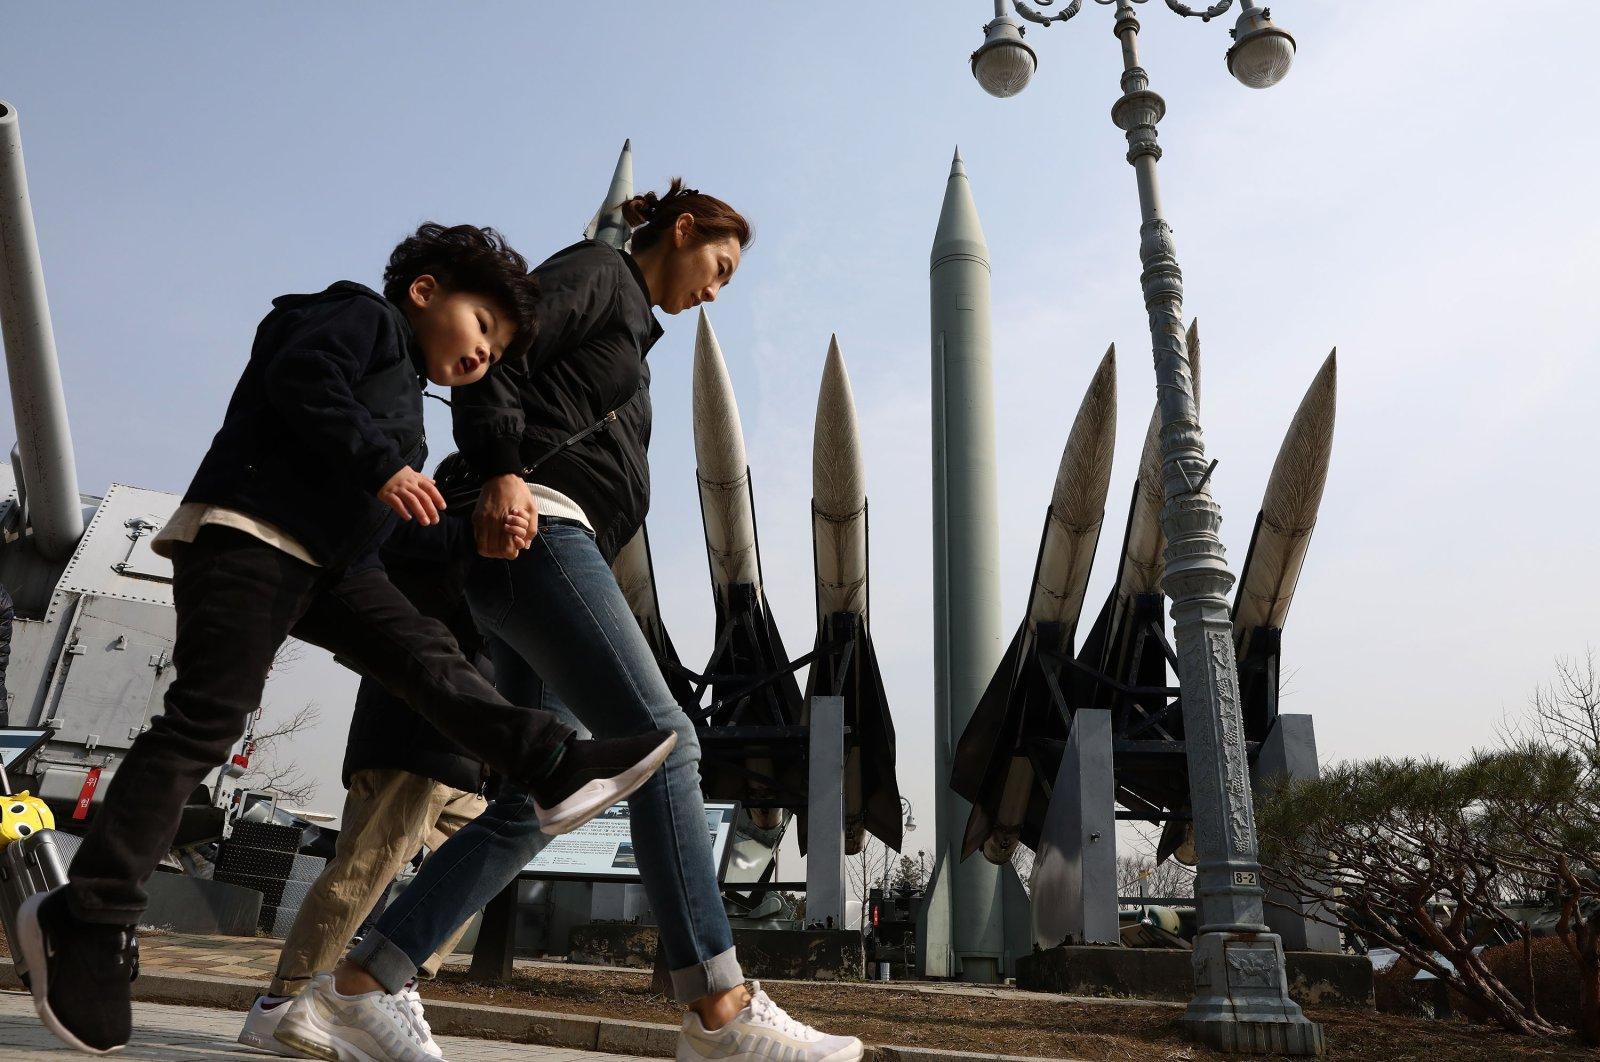 South Koreans walk past replicas of a North Korean Scud-B missile (C, back) and South Korean Nike missile (front) at the Korean War Memorial,  Seoul, South Korea, Feb. 28, 2019. (Getty Images)